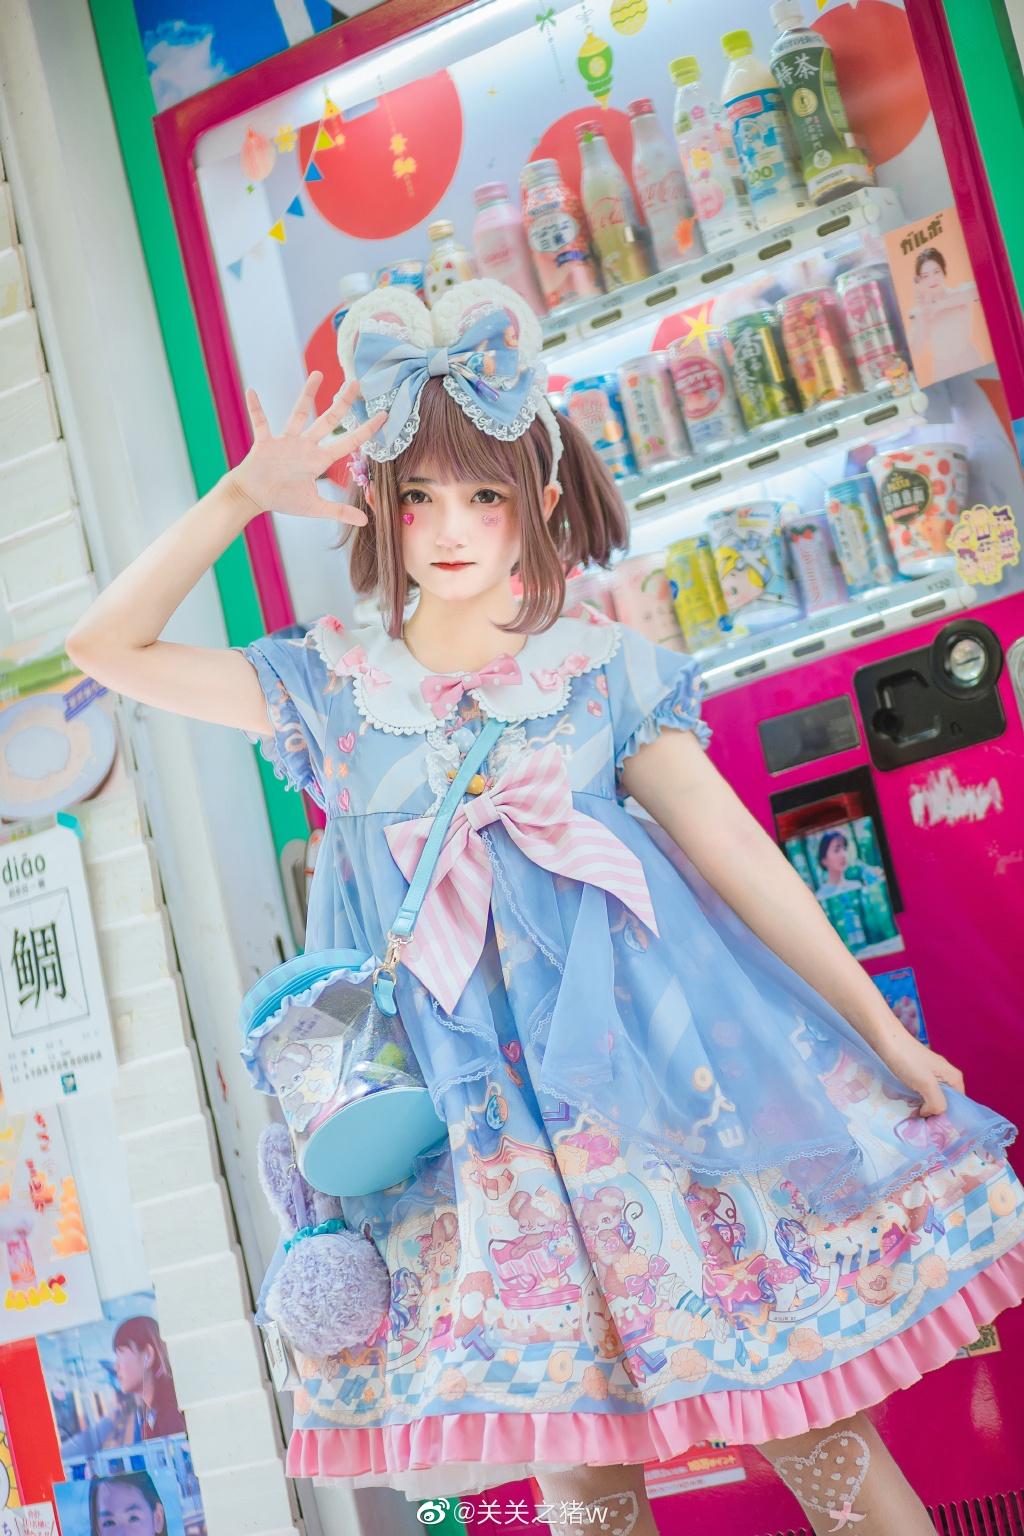 [LOLITA] bobo甜鼠 @关关之猪w 时尚-第2张